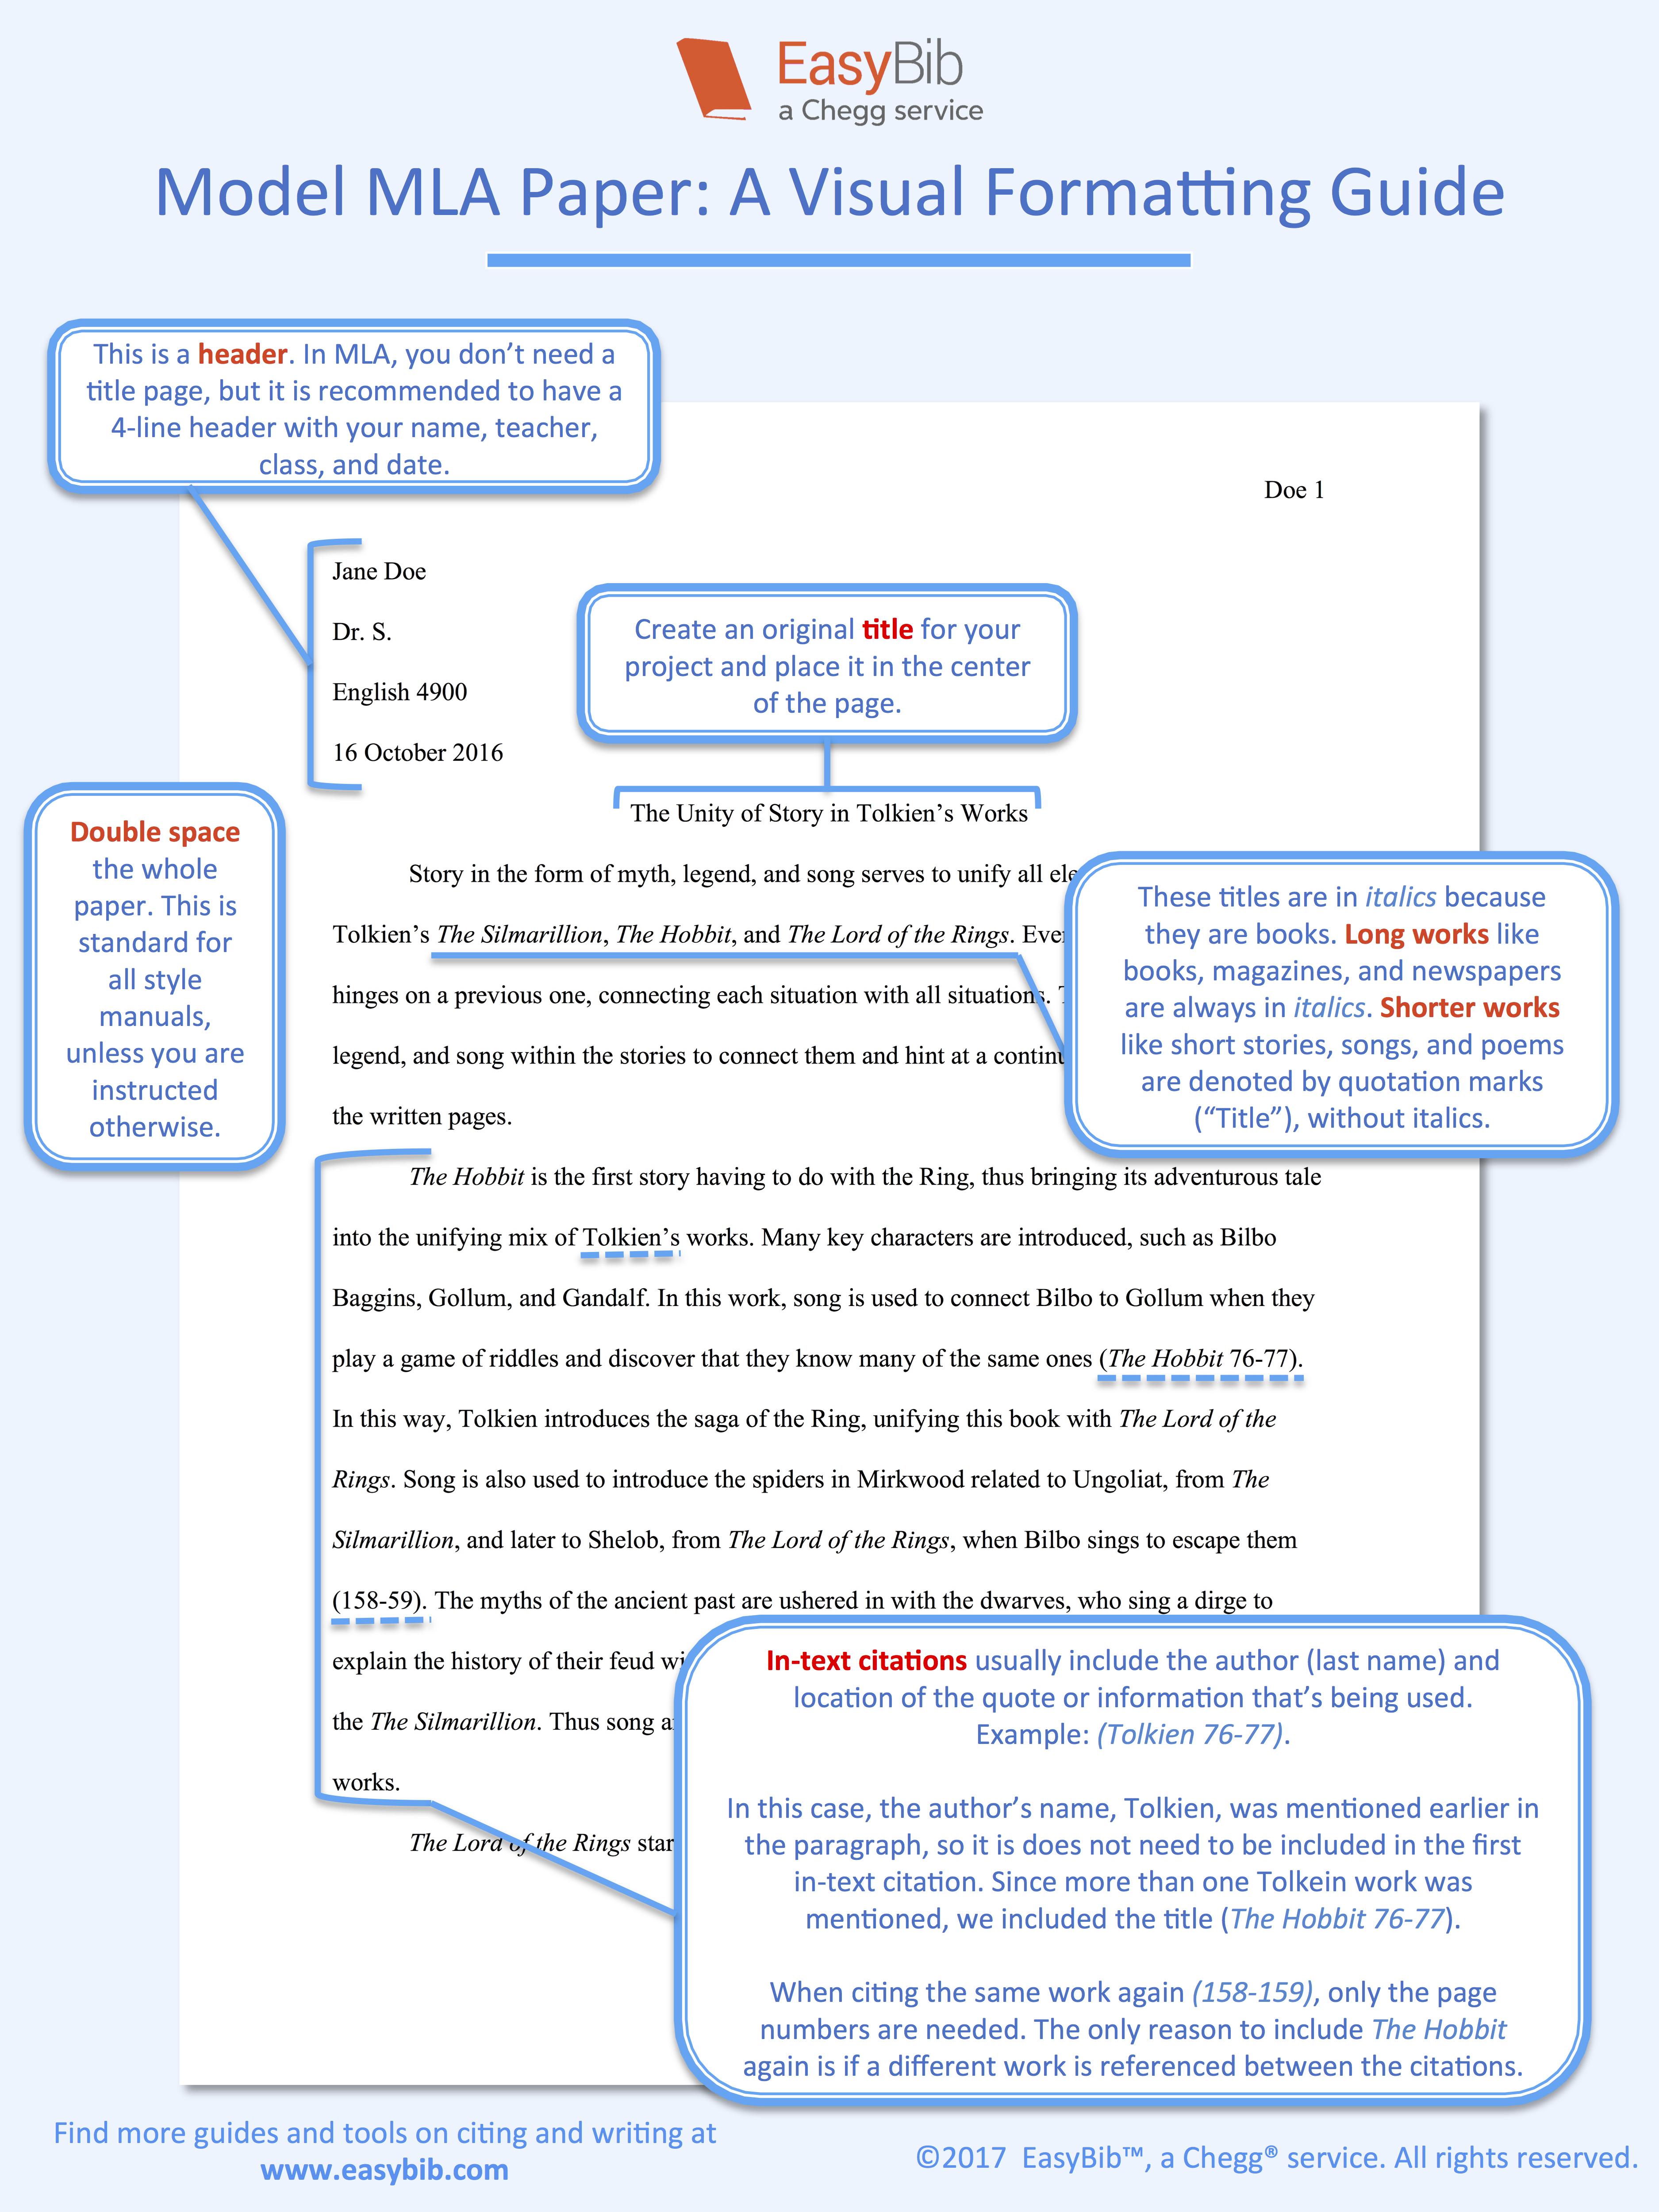 008 Essay Font Size Model Mla Paper Stunning Formal Apa Full